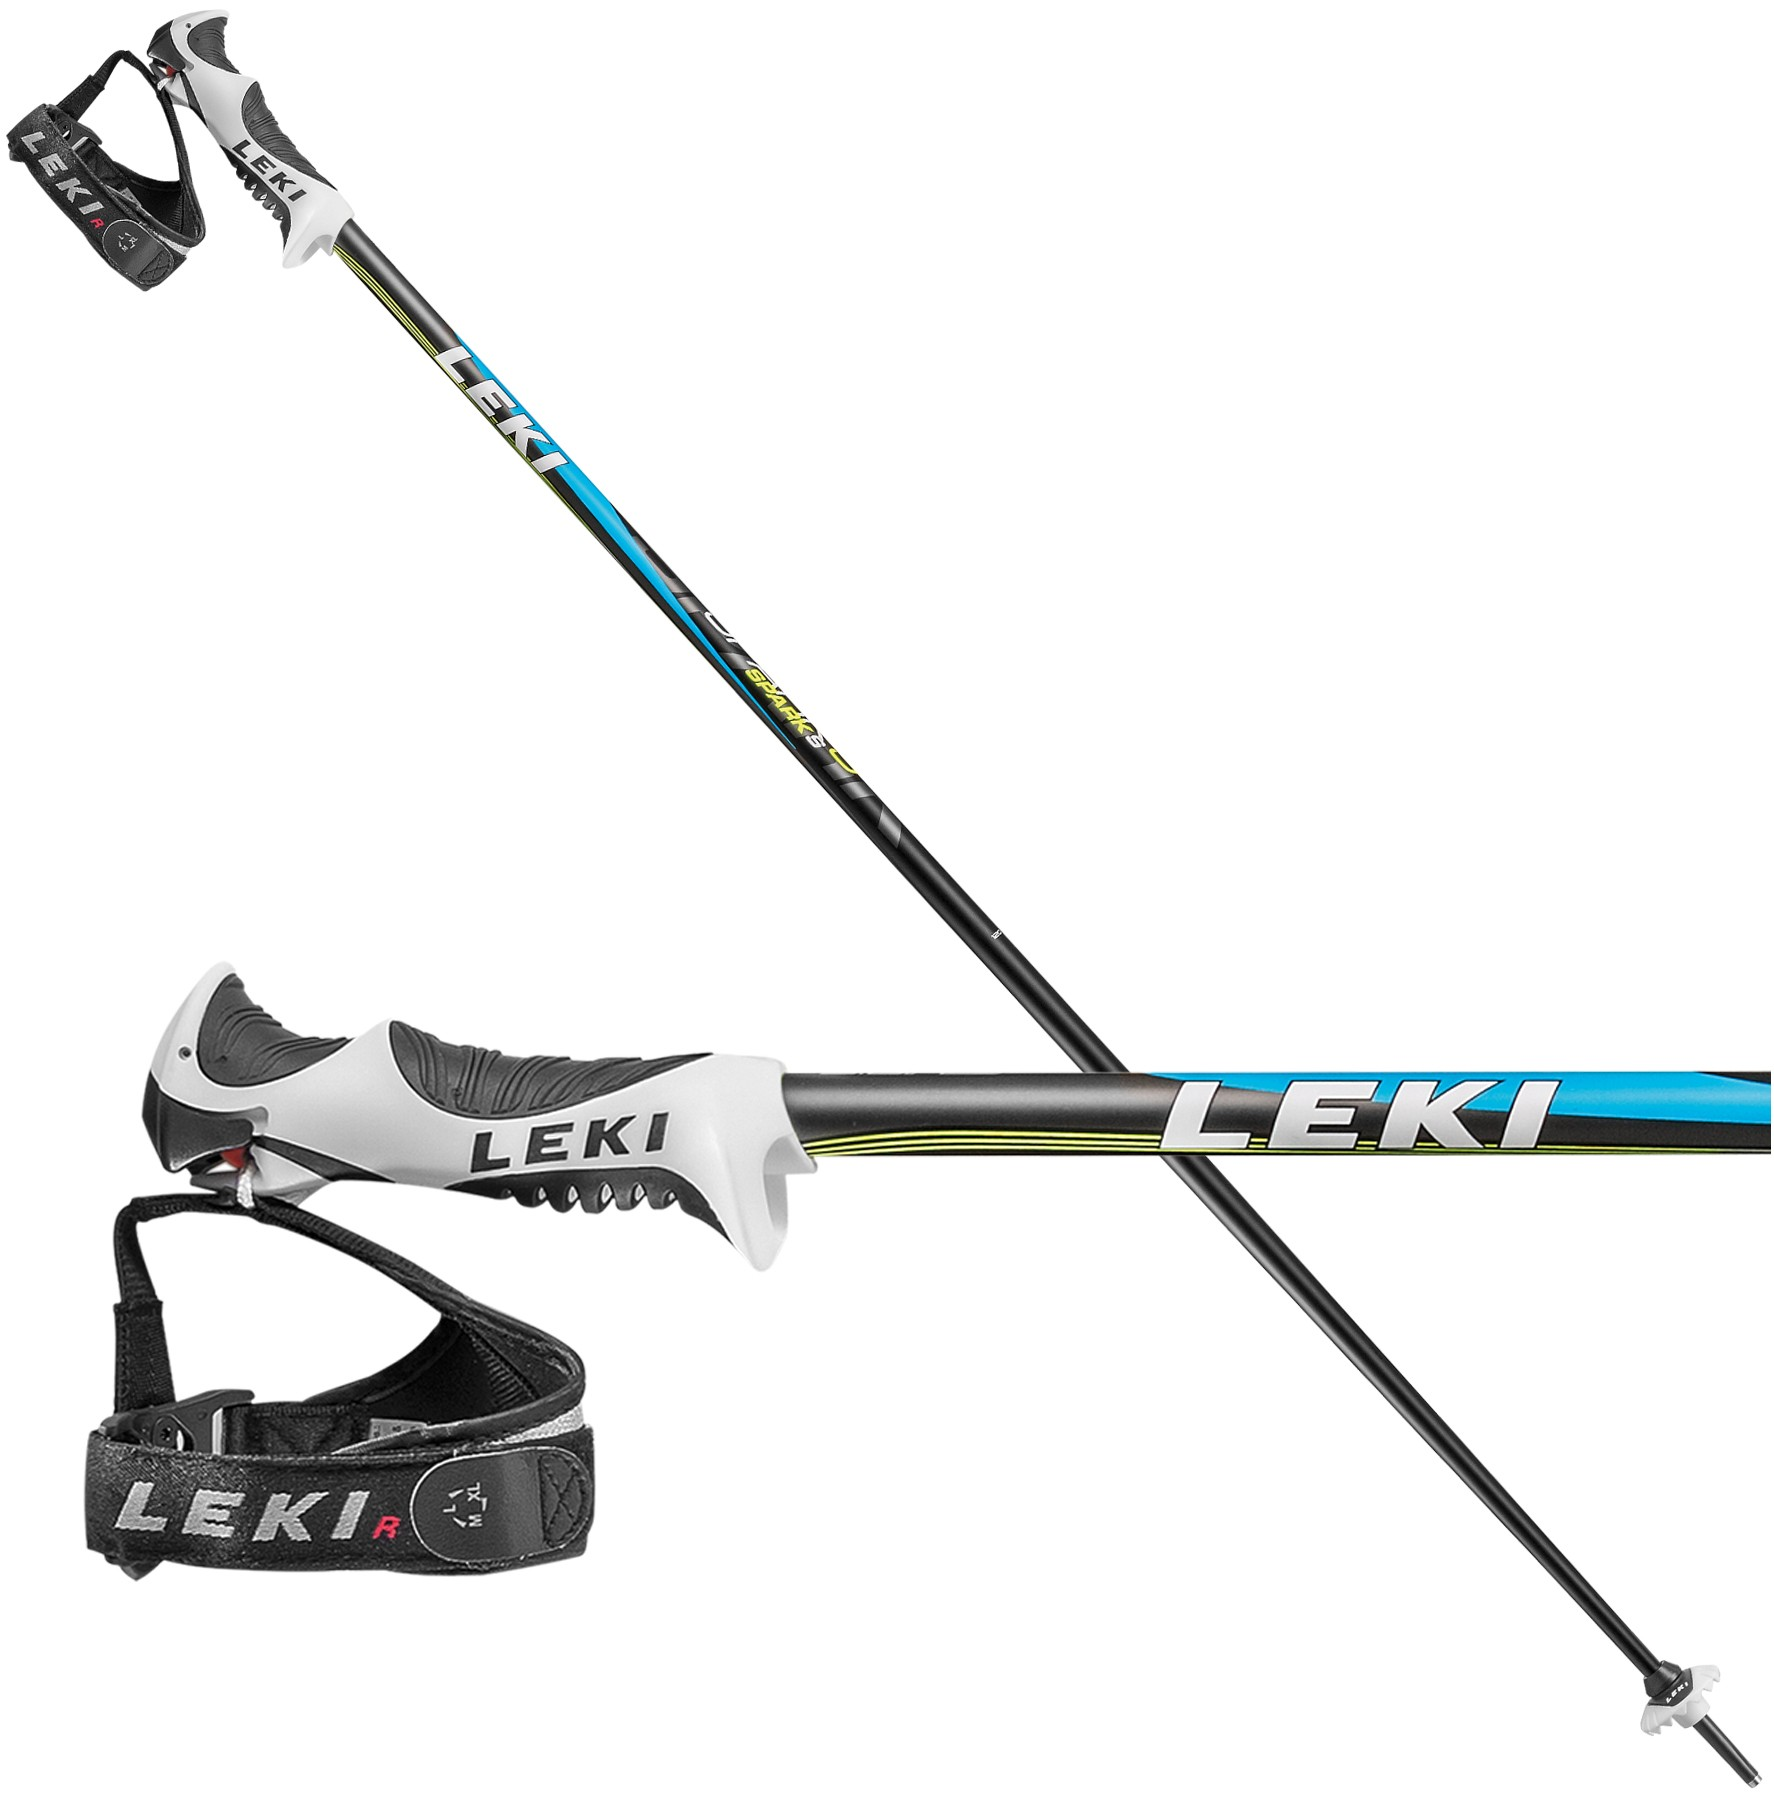 Leki Spark S ski poles, 2017